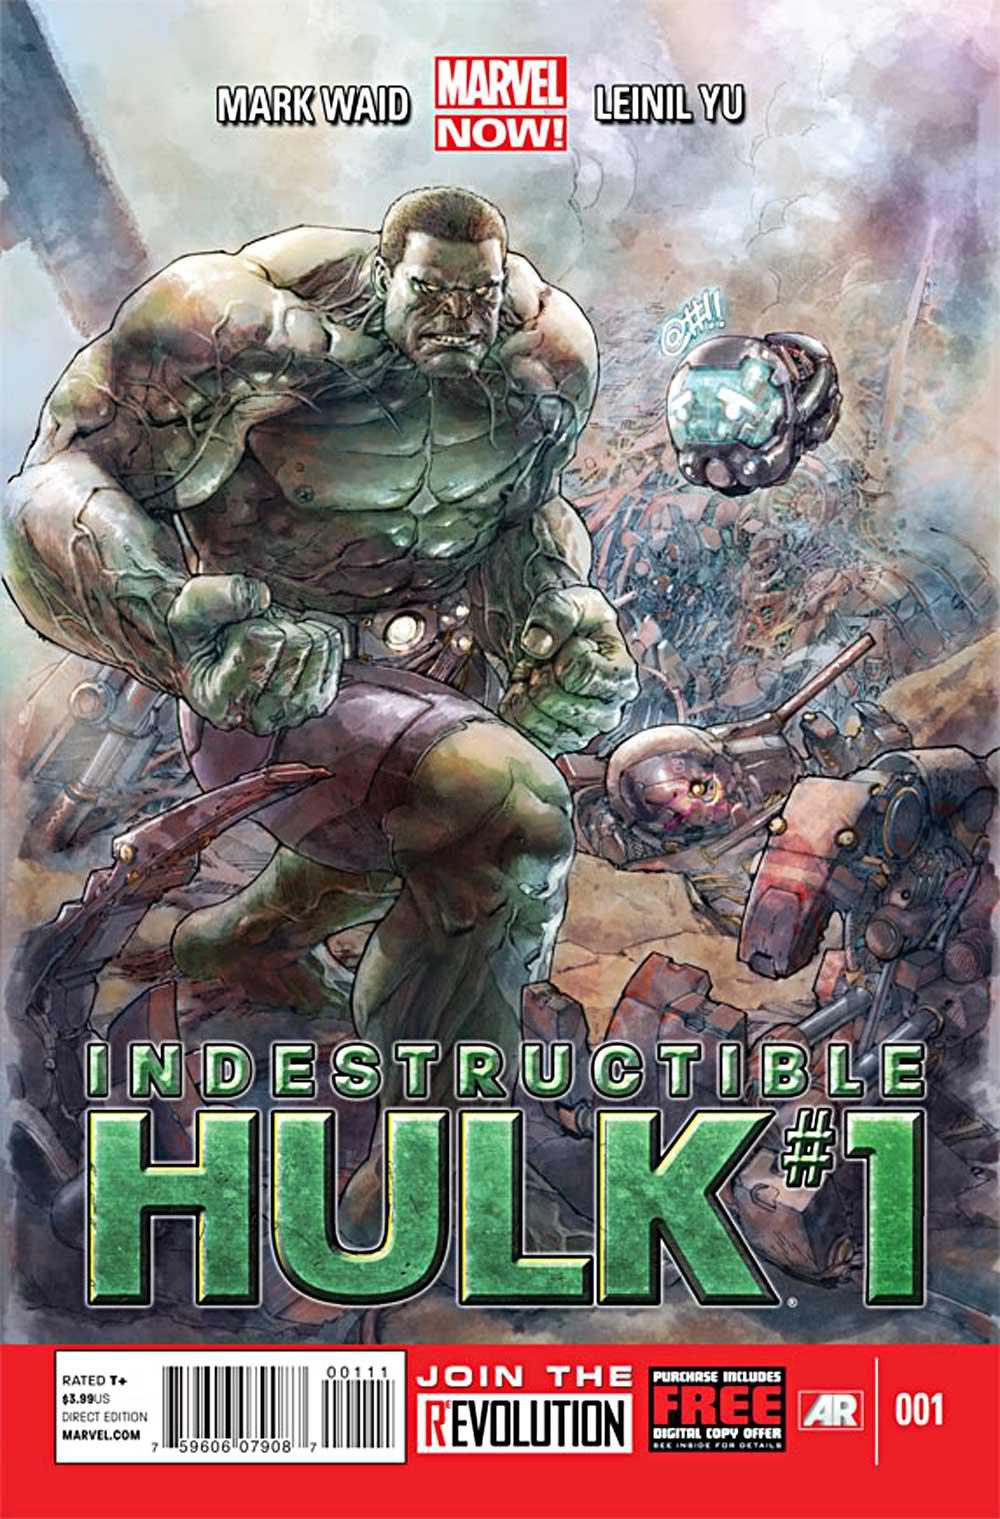 hulk2012001dc11